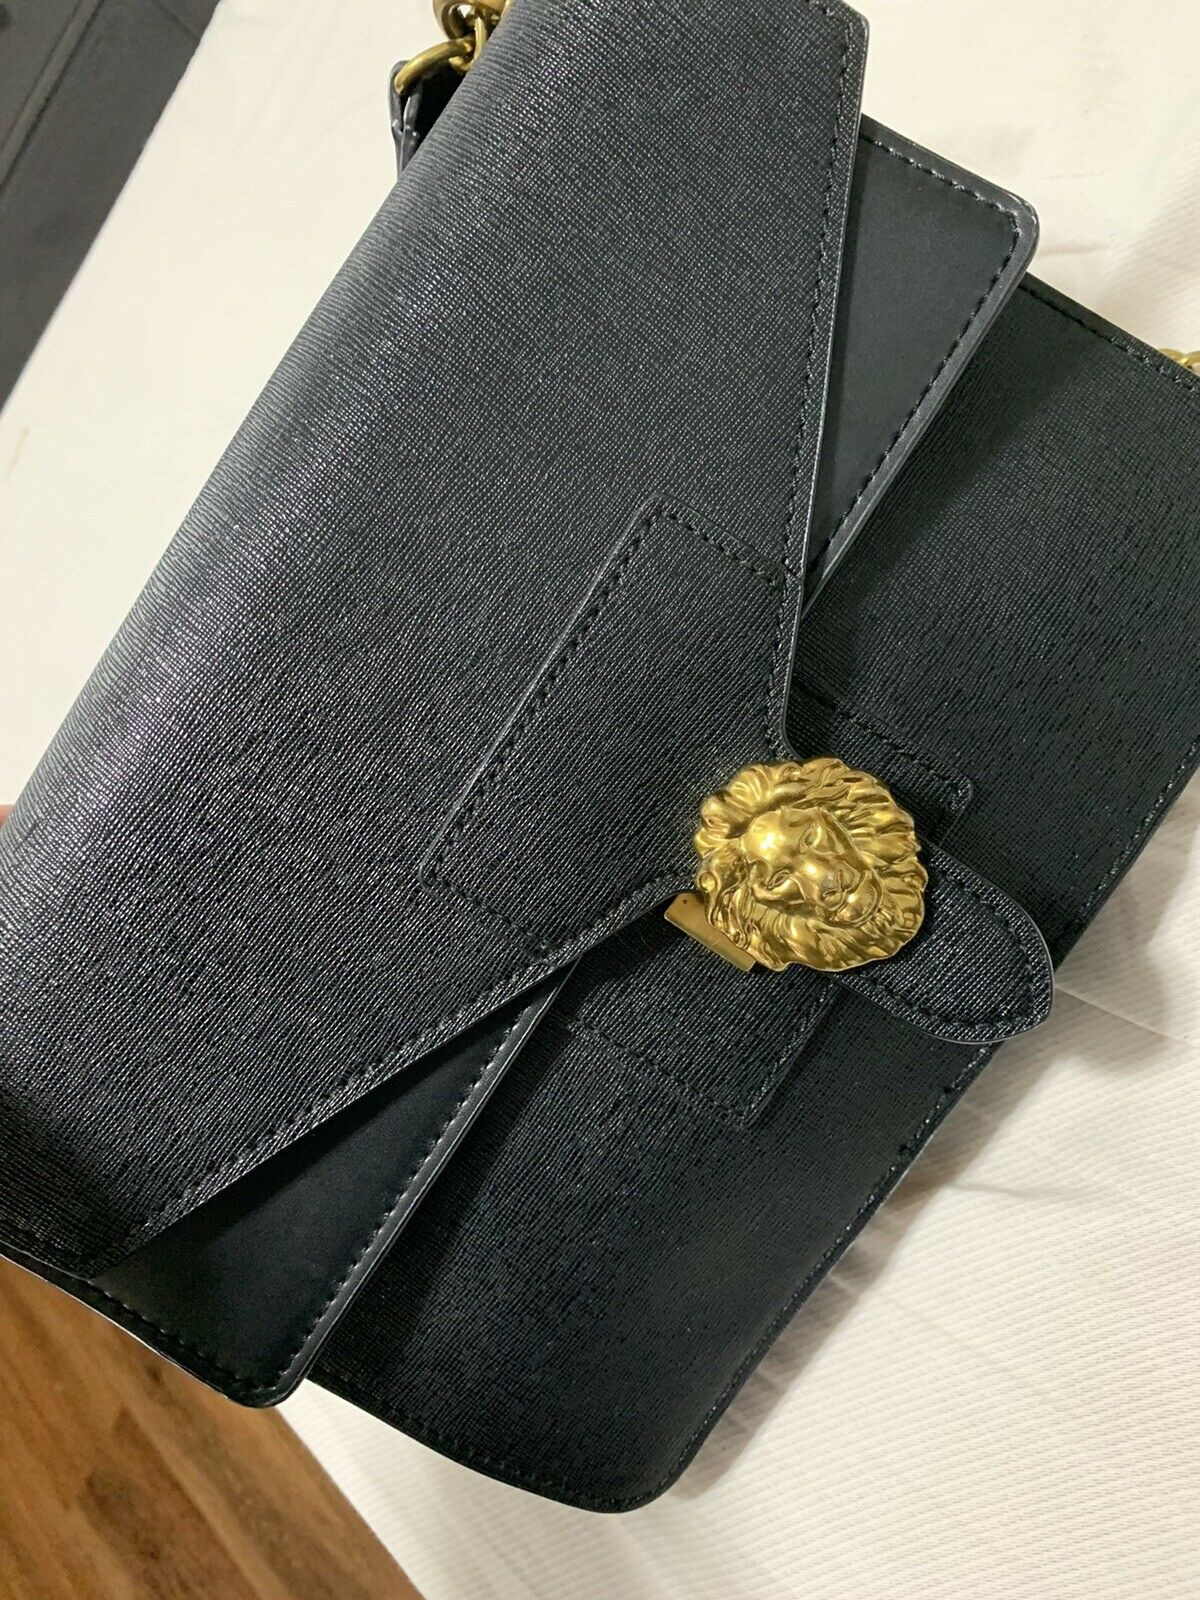 ann klein diana double flap chain handbag - image 1